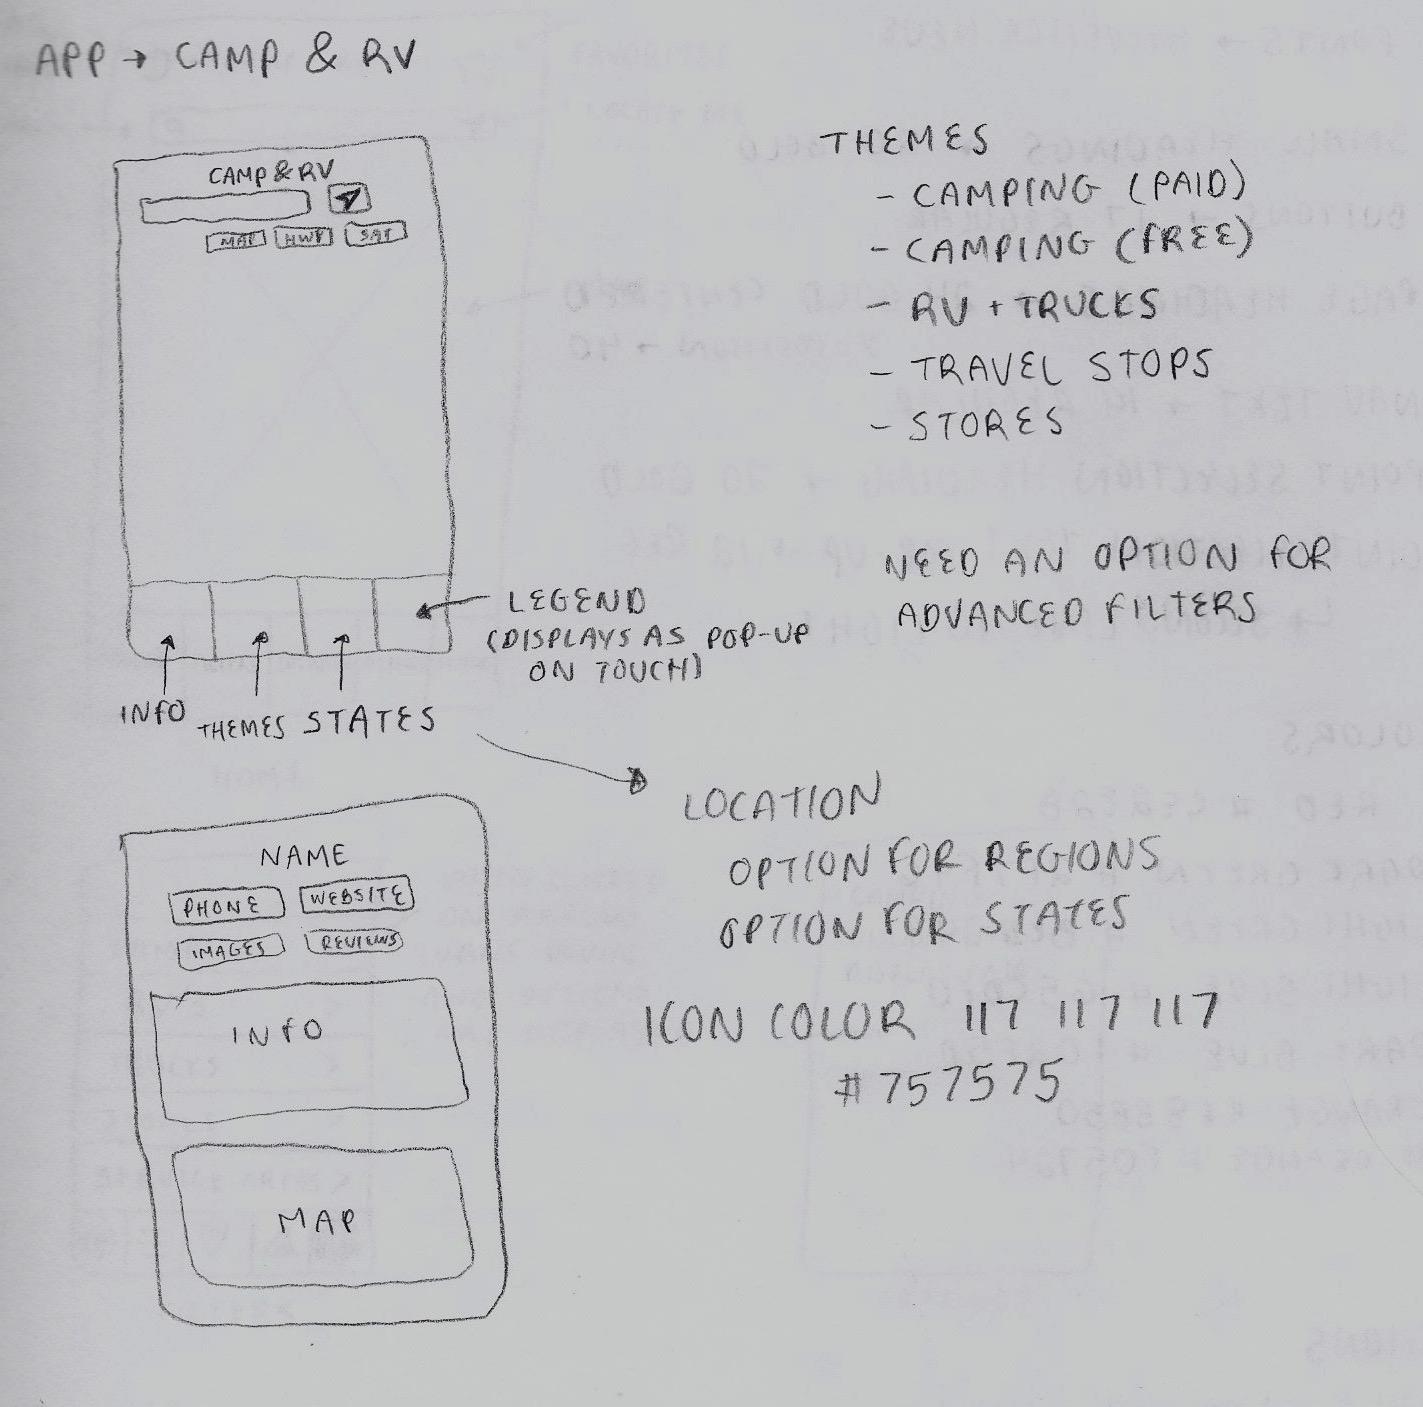 Camp & RV Process.jpg